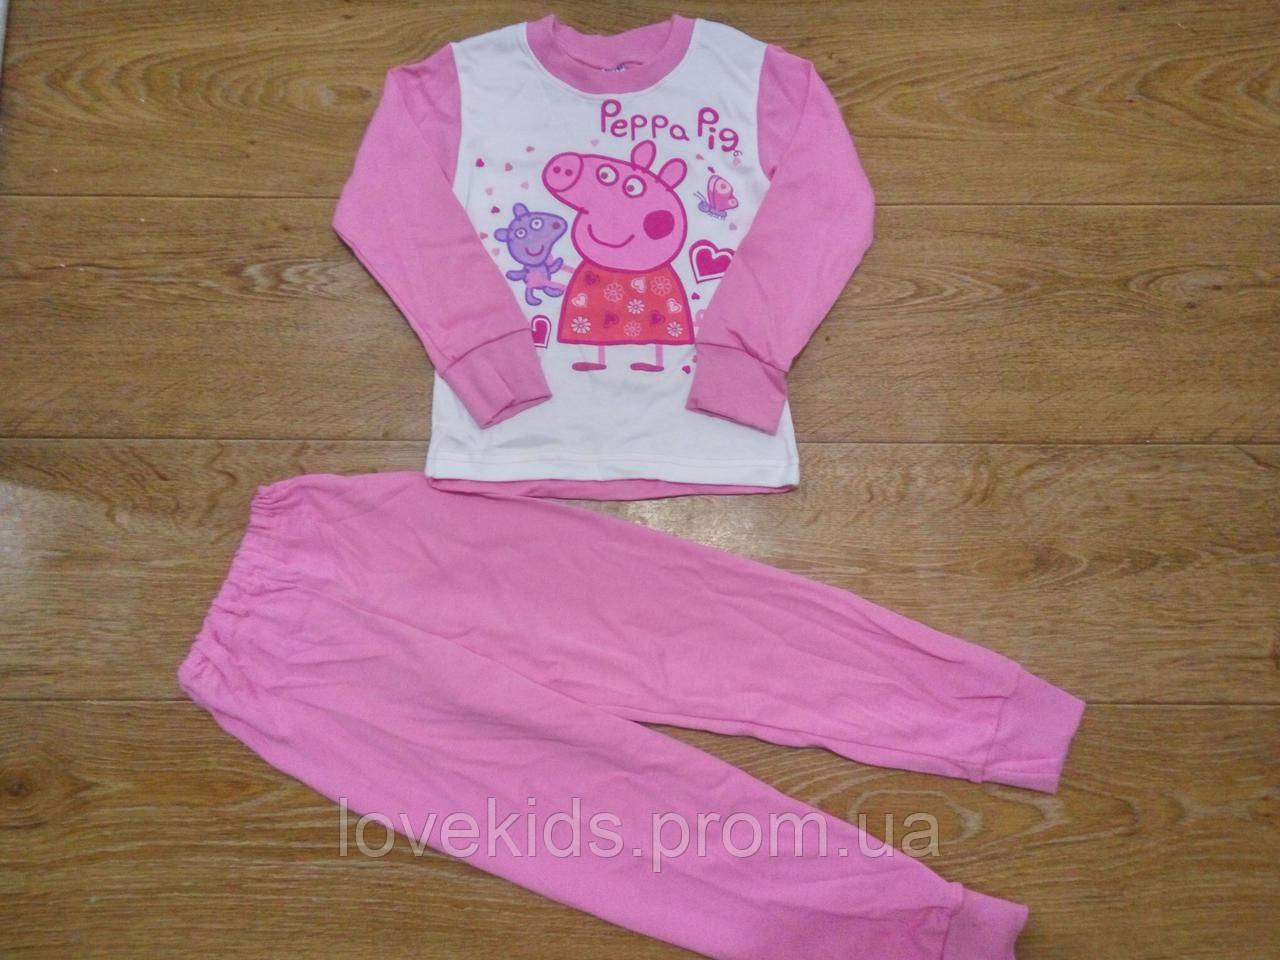 66b4c93c81be Пижама для девочки Свинка Пеппа 98-122 см (интерлок) - Интернет-магазин